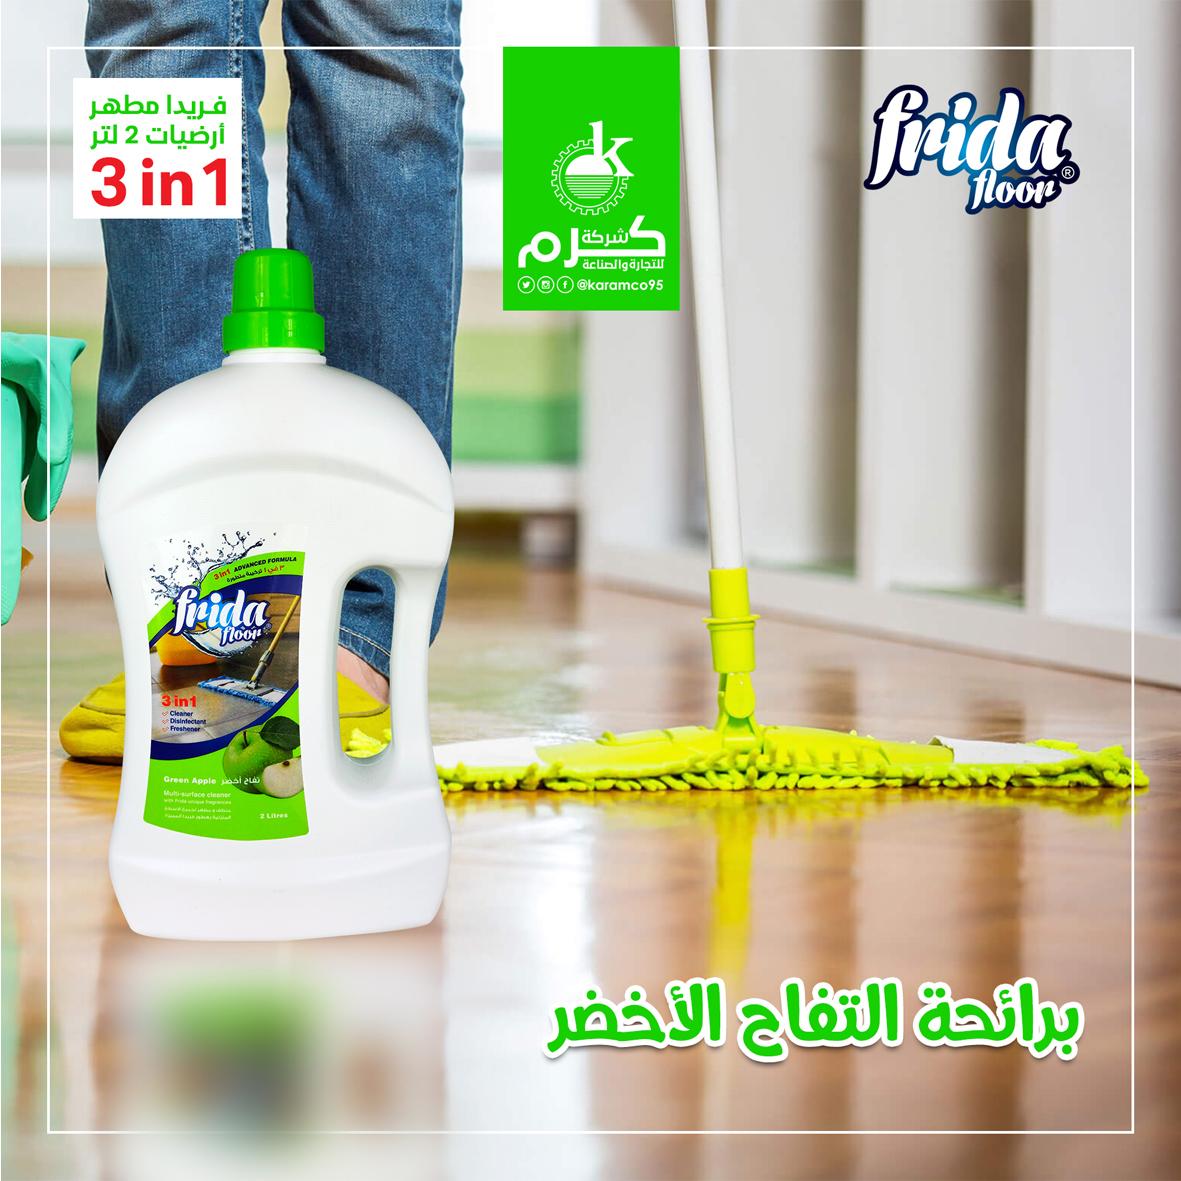 Frida Floor Green Apple 2 Liter